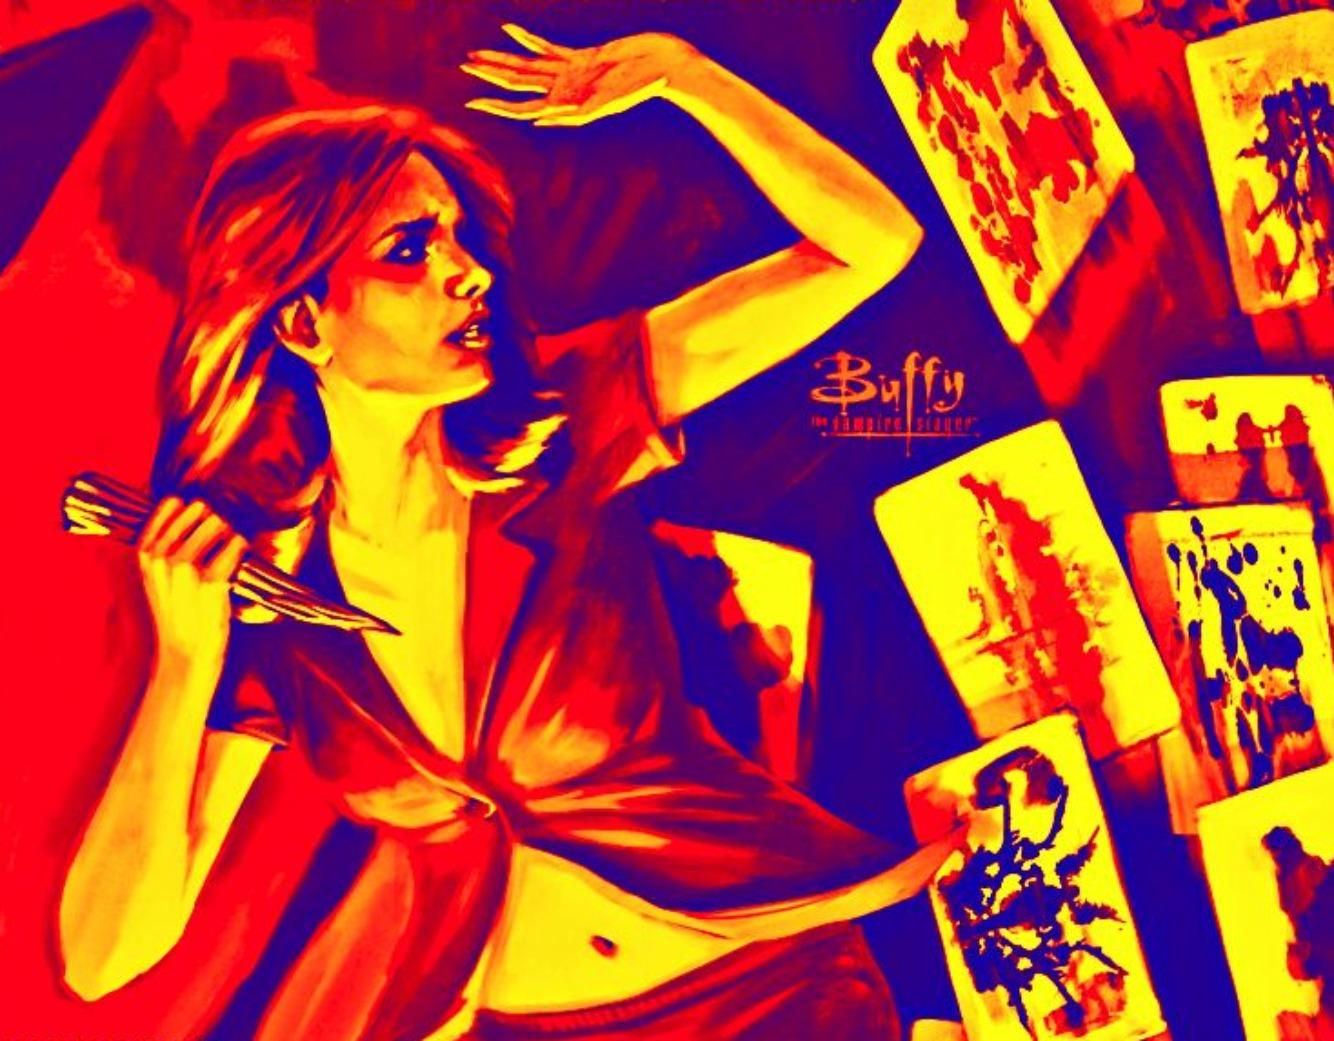 BUFFY THE VAMPIRE SLAYER♥